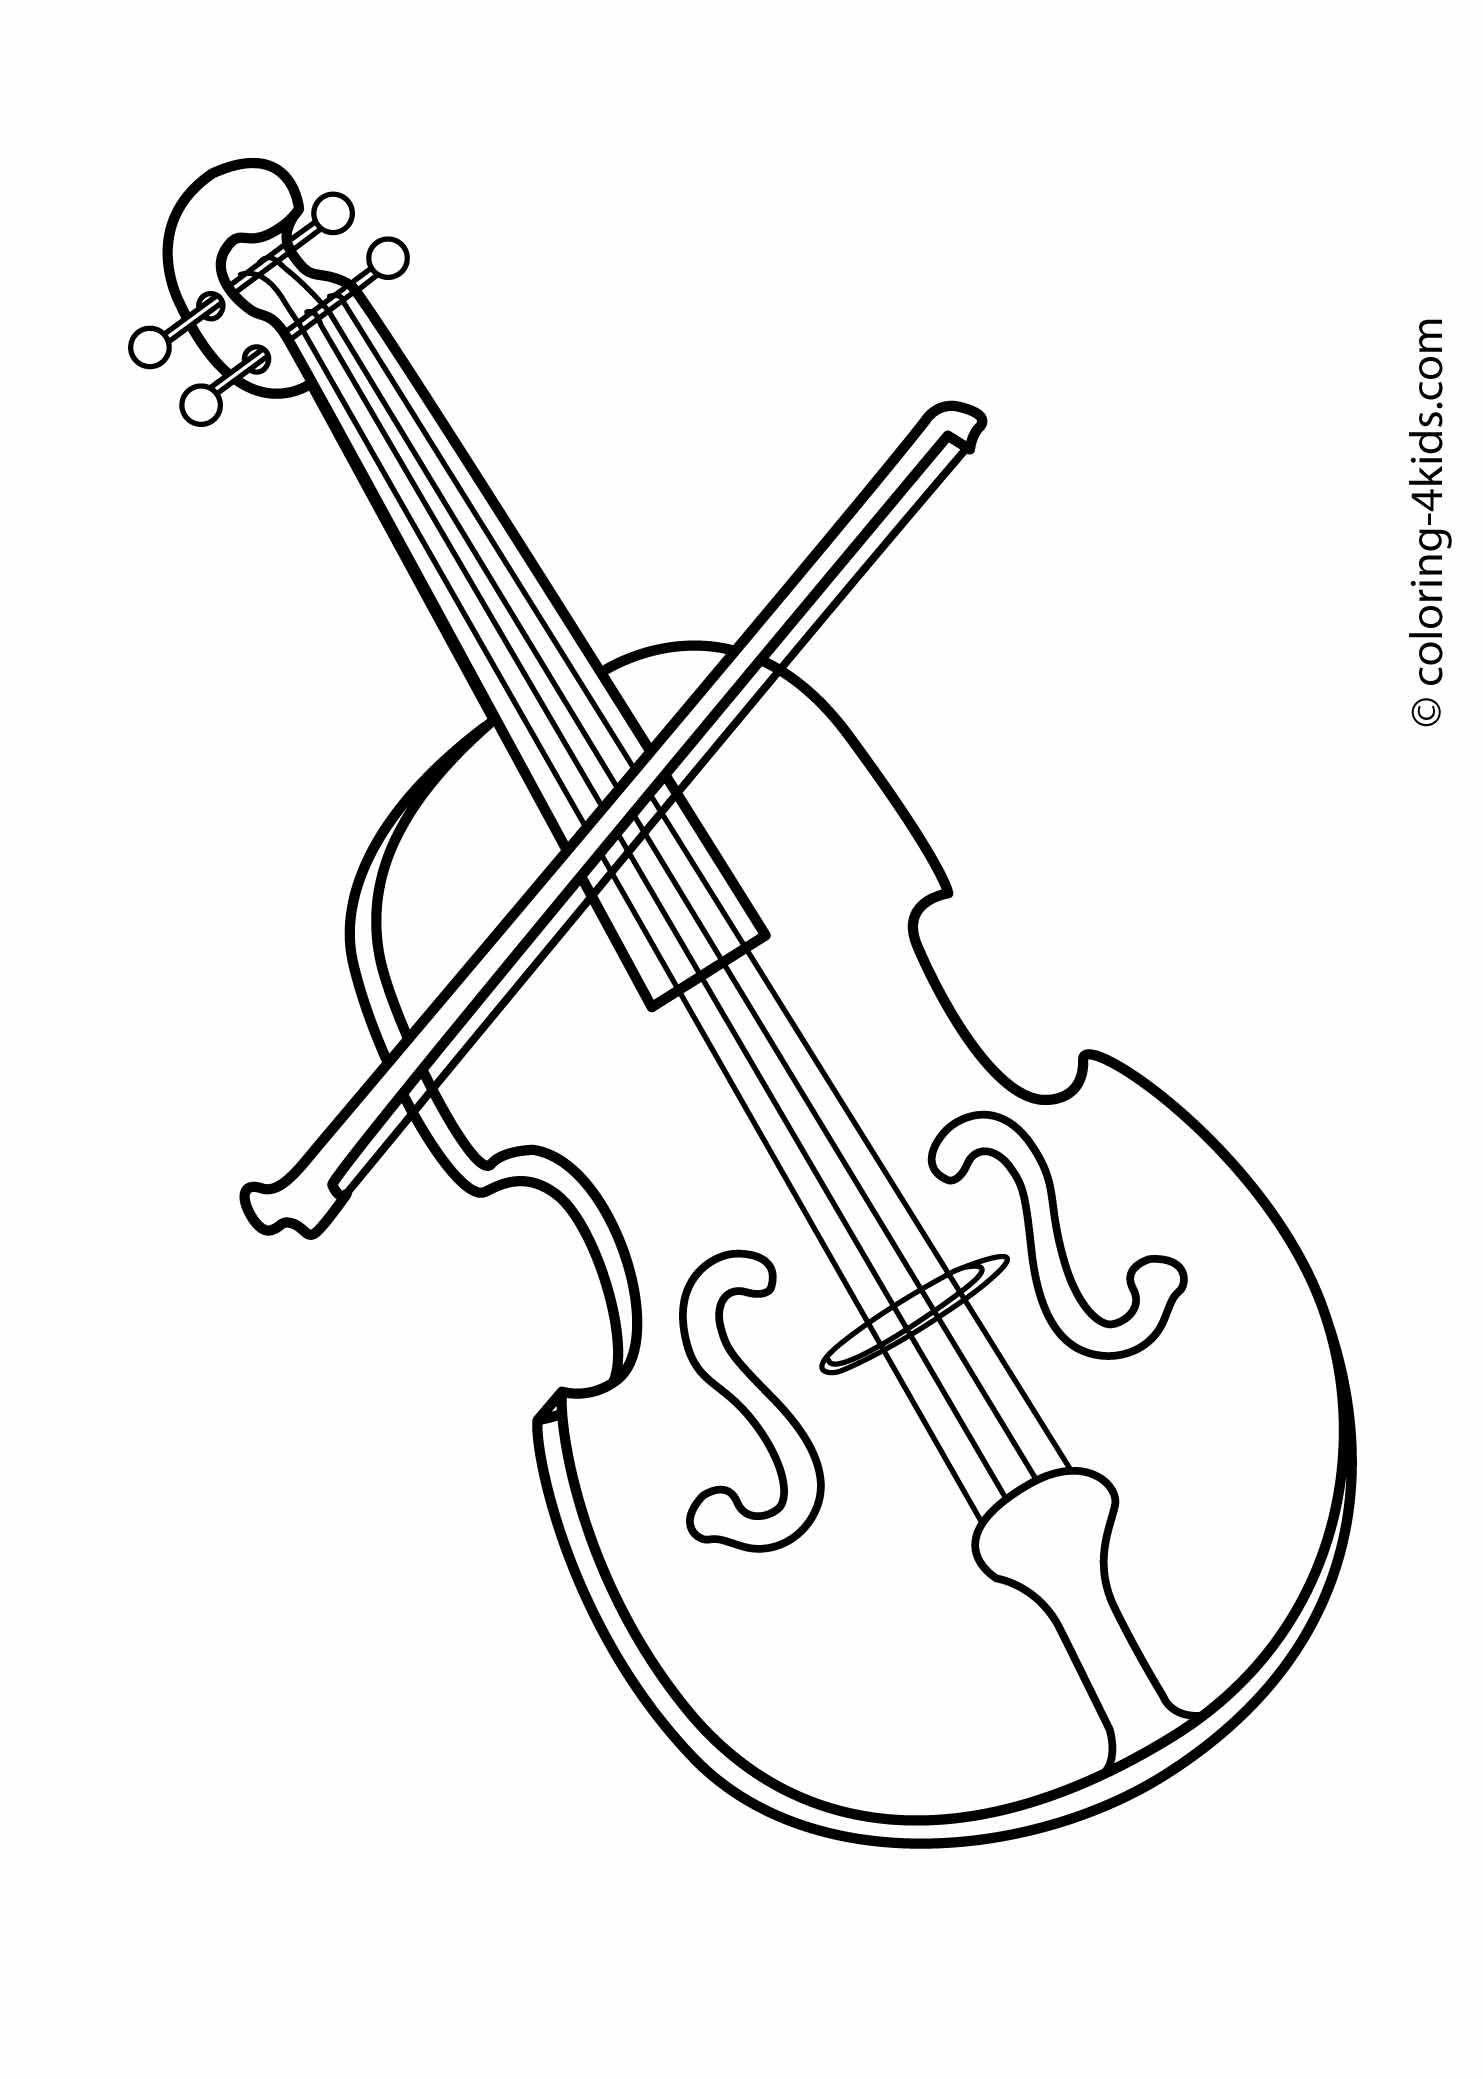 violin musical instruments coloring pages | musique et sons